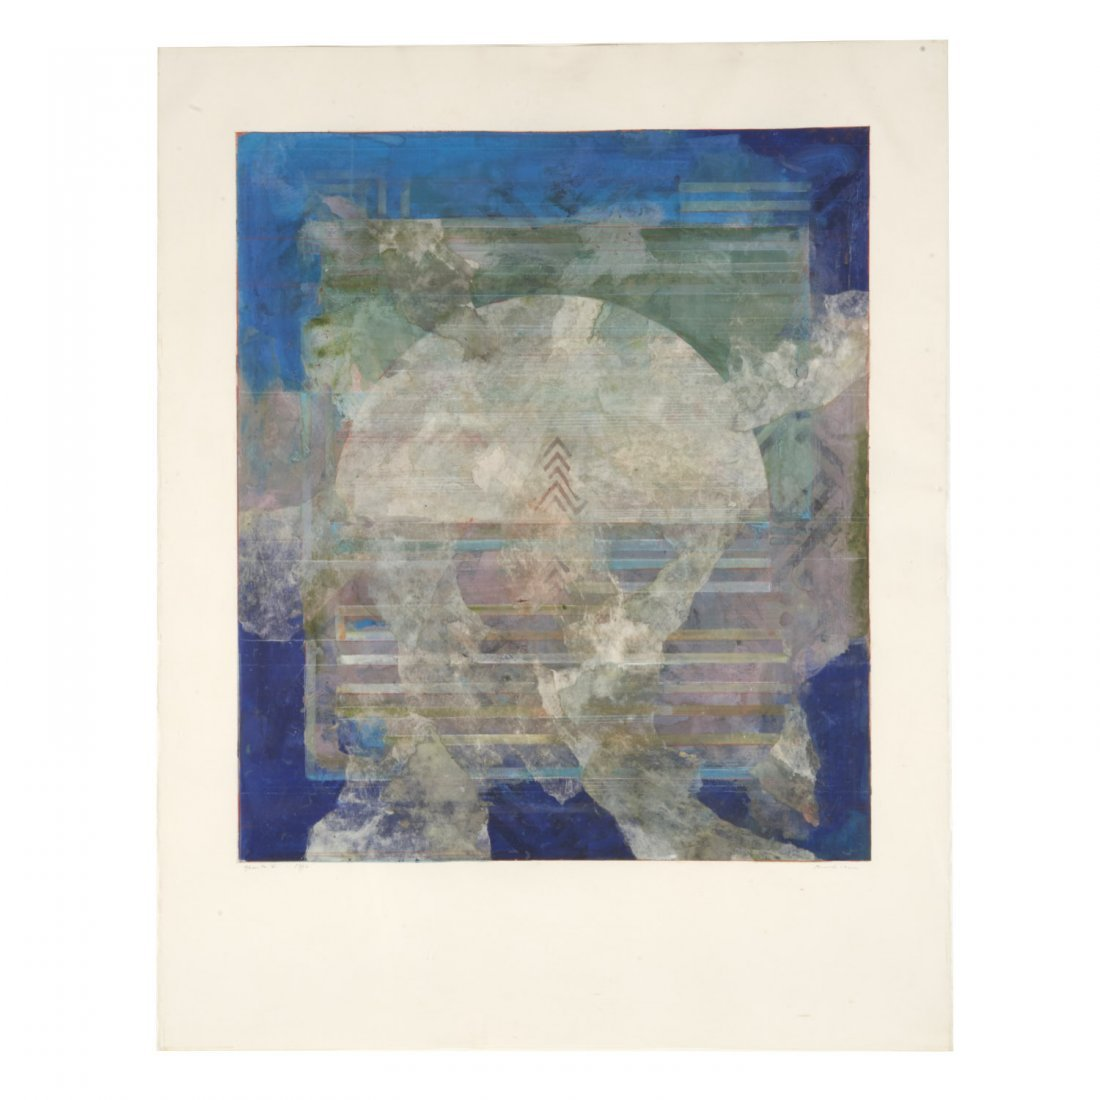 Robert Kelly, large collage monoprint